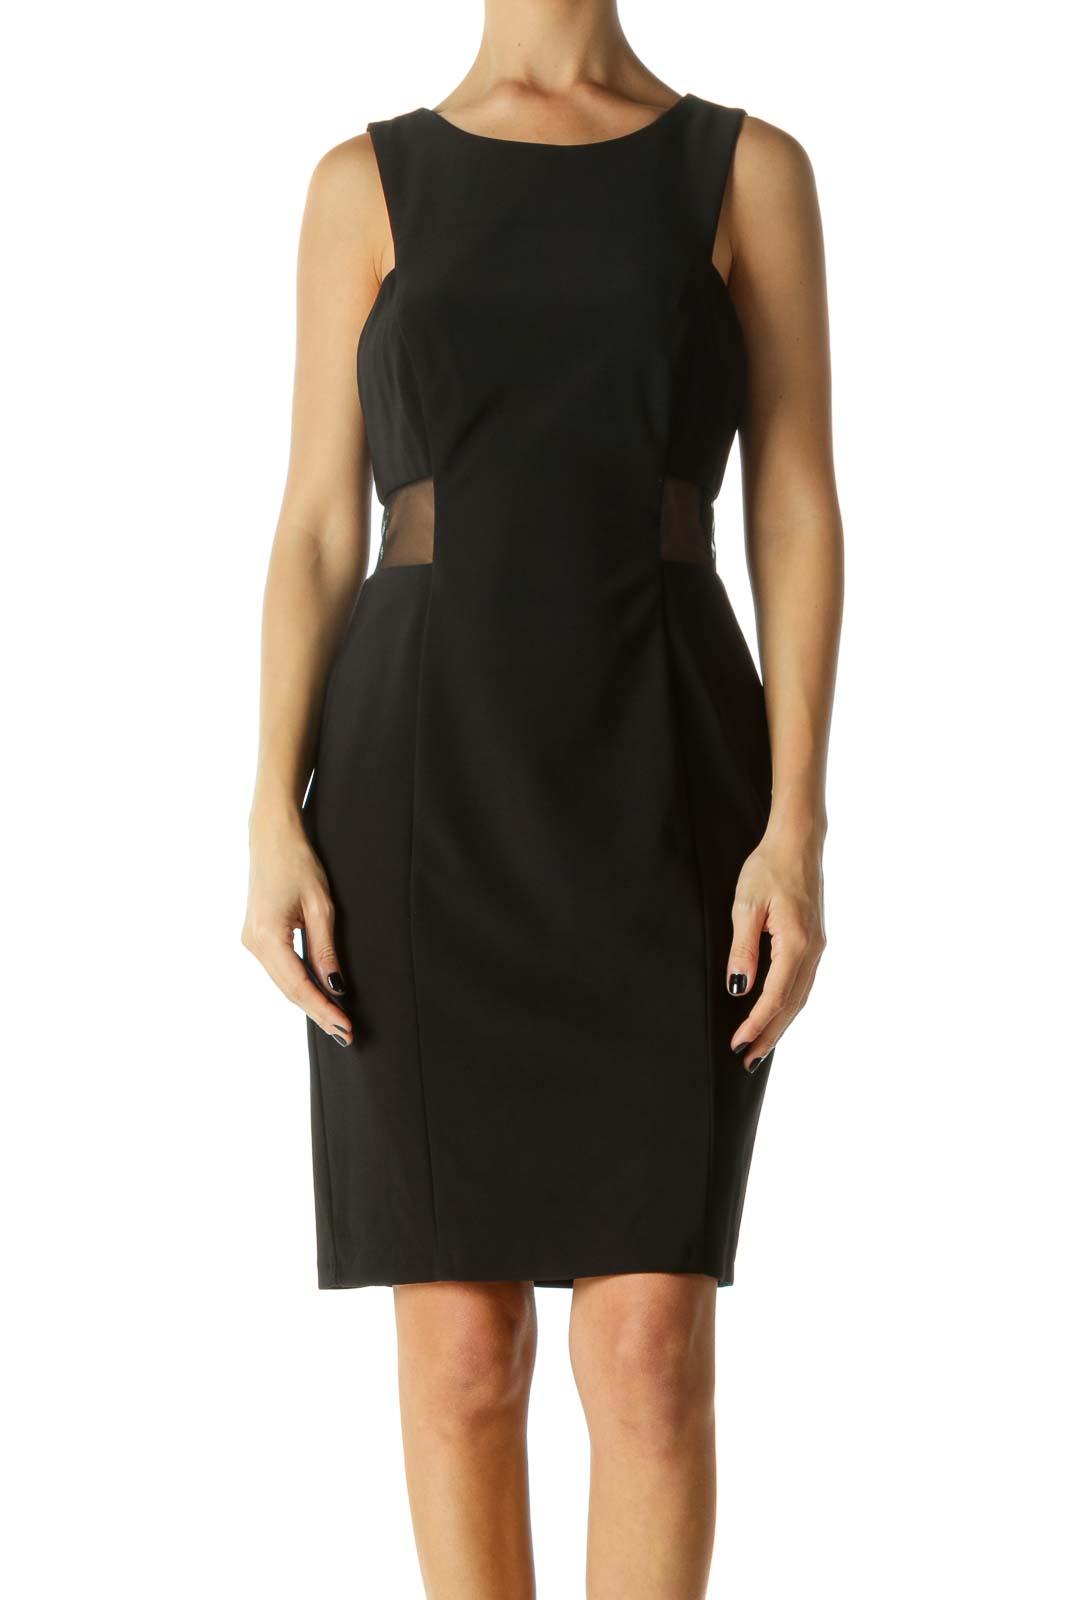 Black Mesh Ruffled Sleeveless Cocktail Dress Front